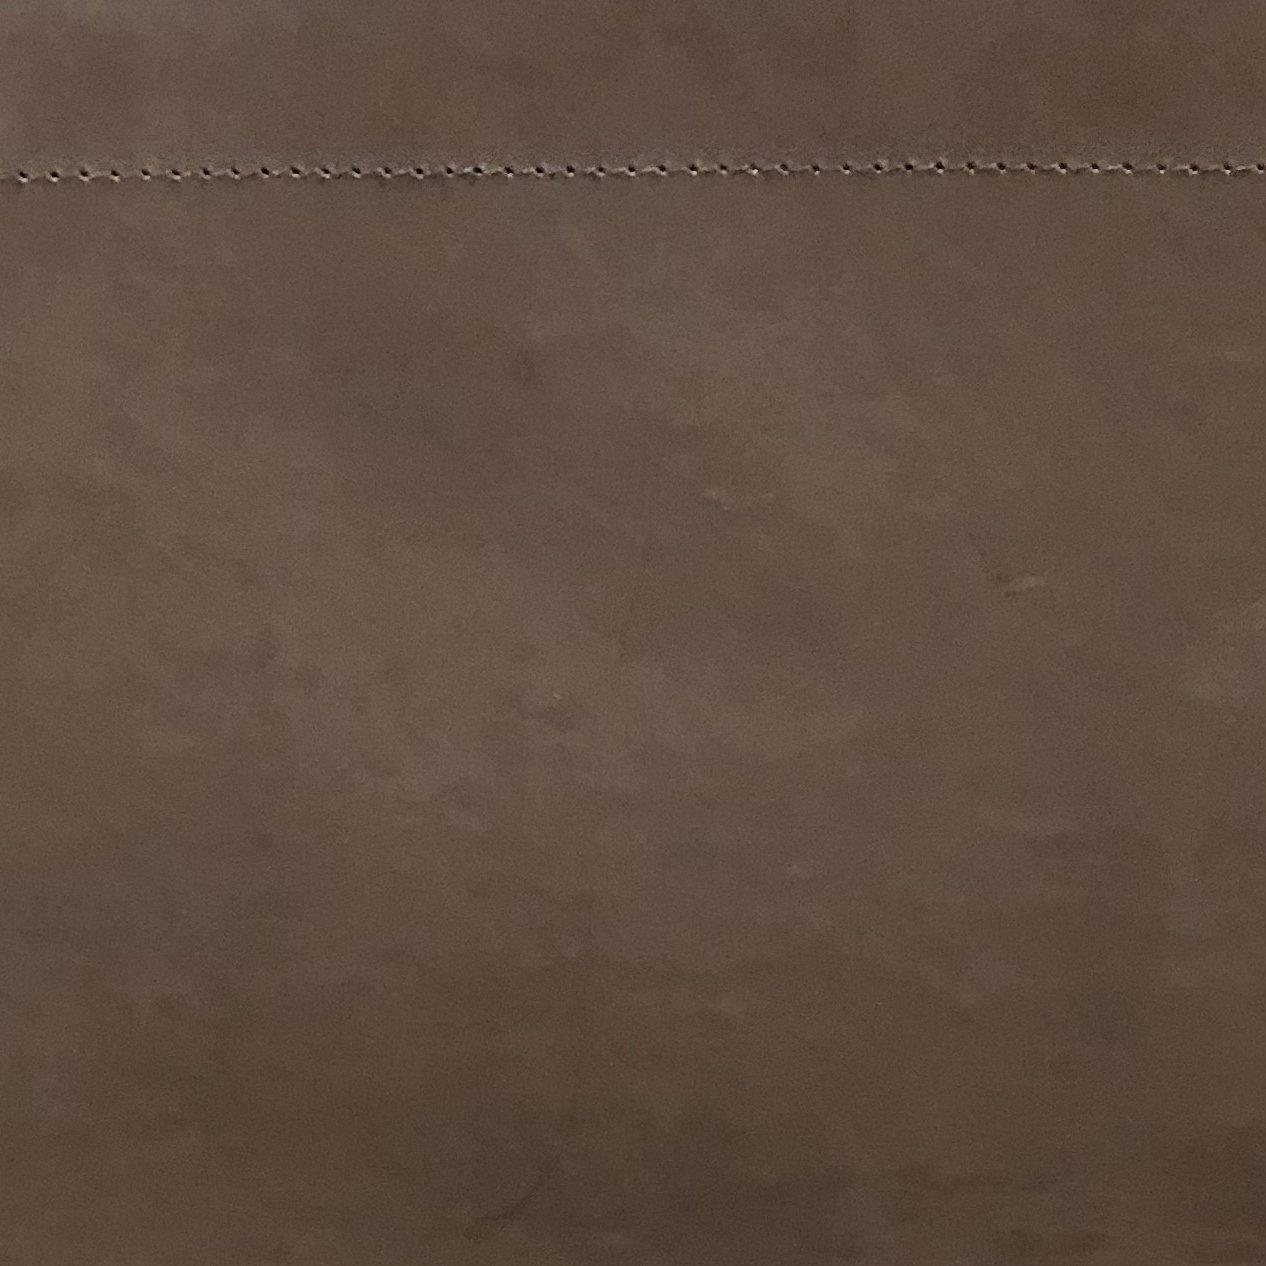 Mørkebrun læder (NDG)